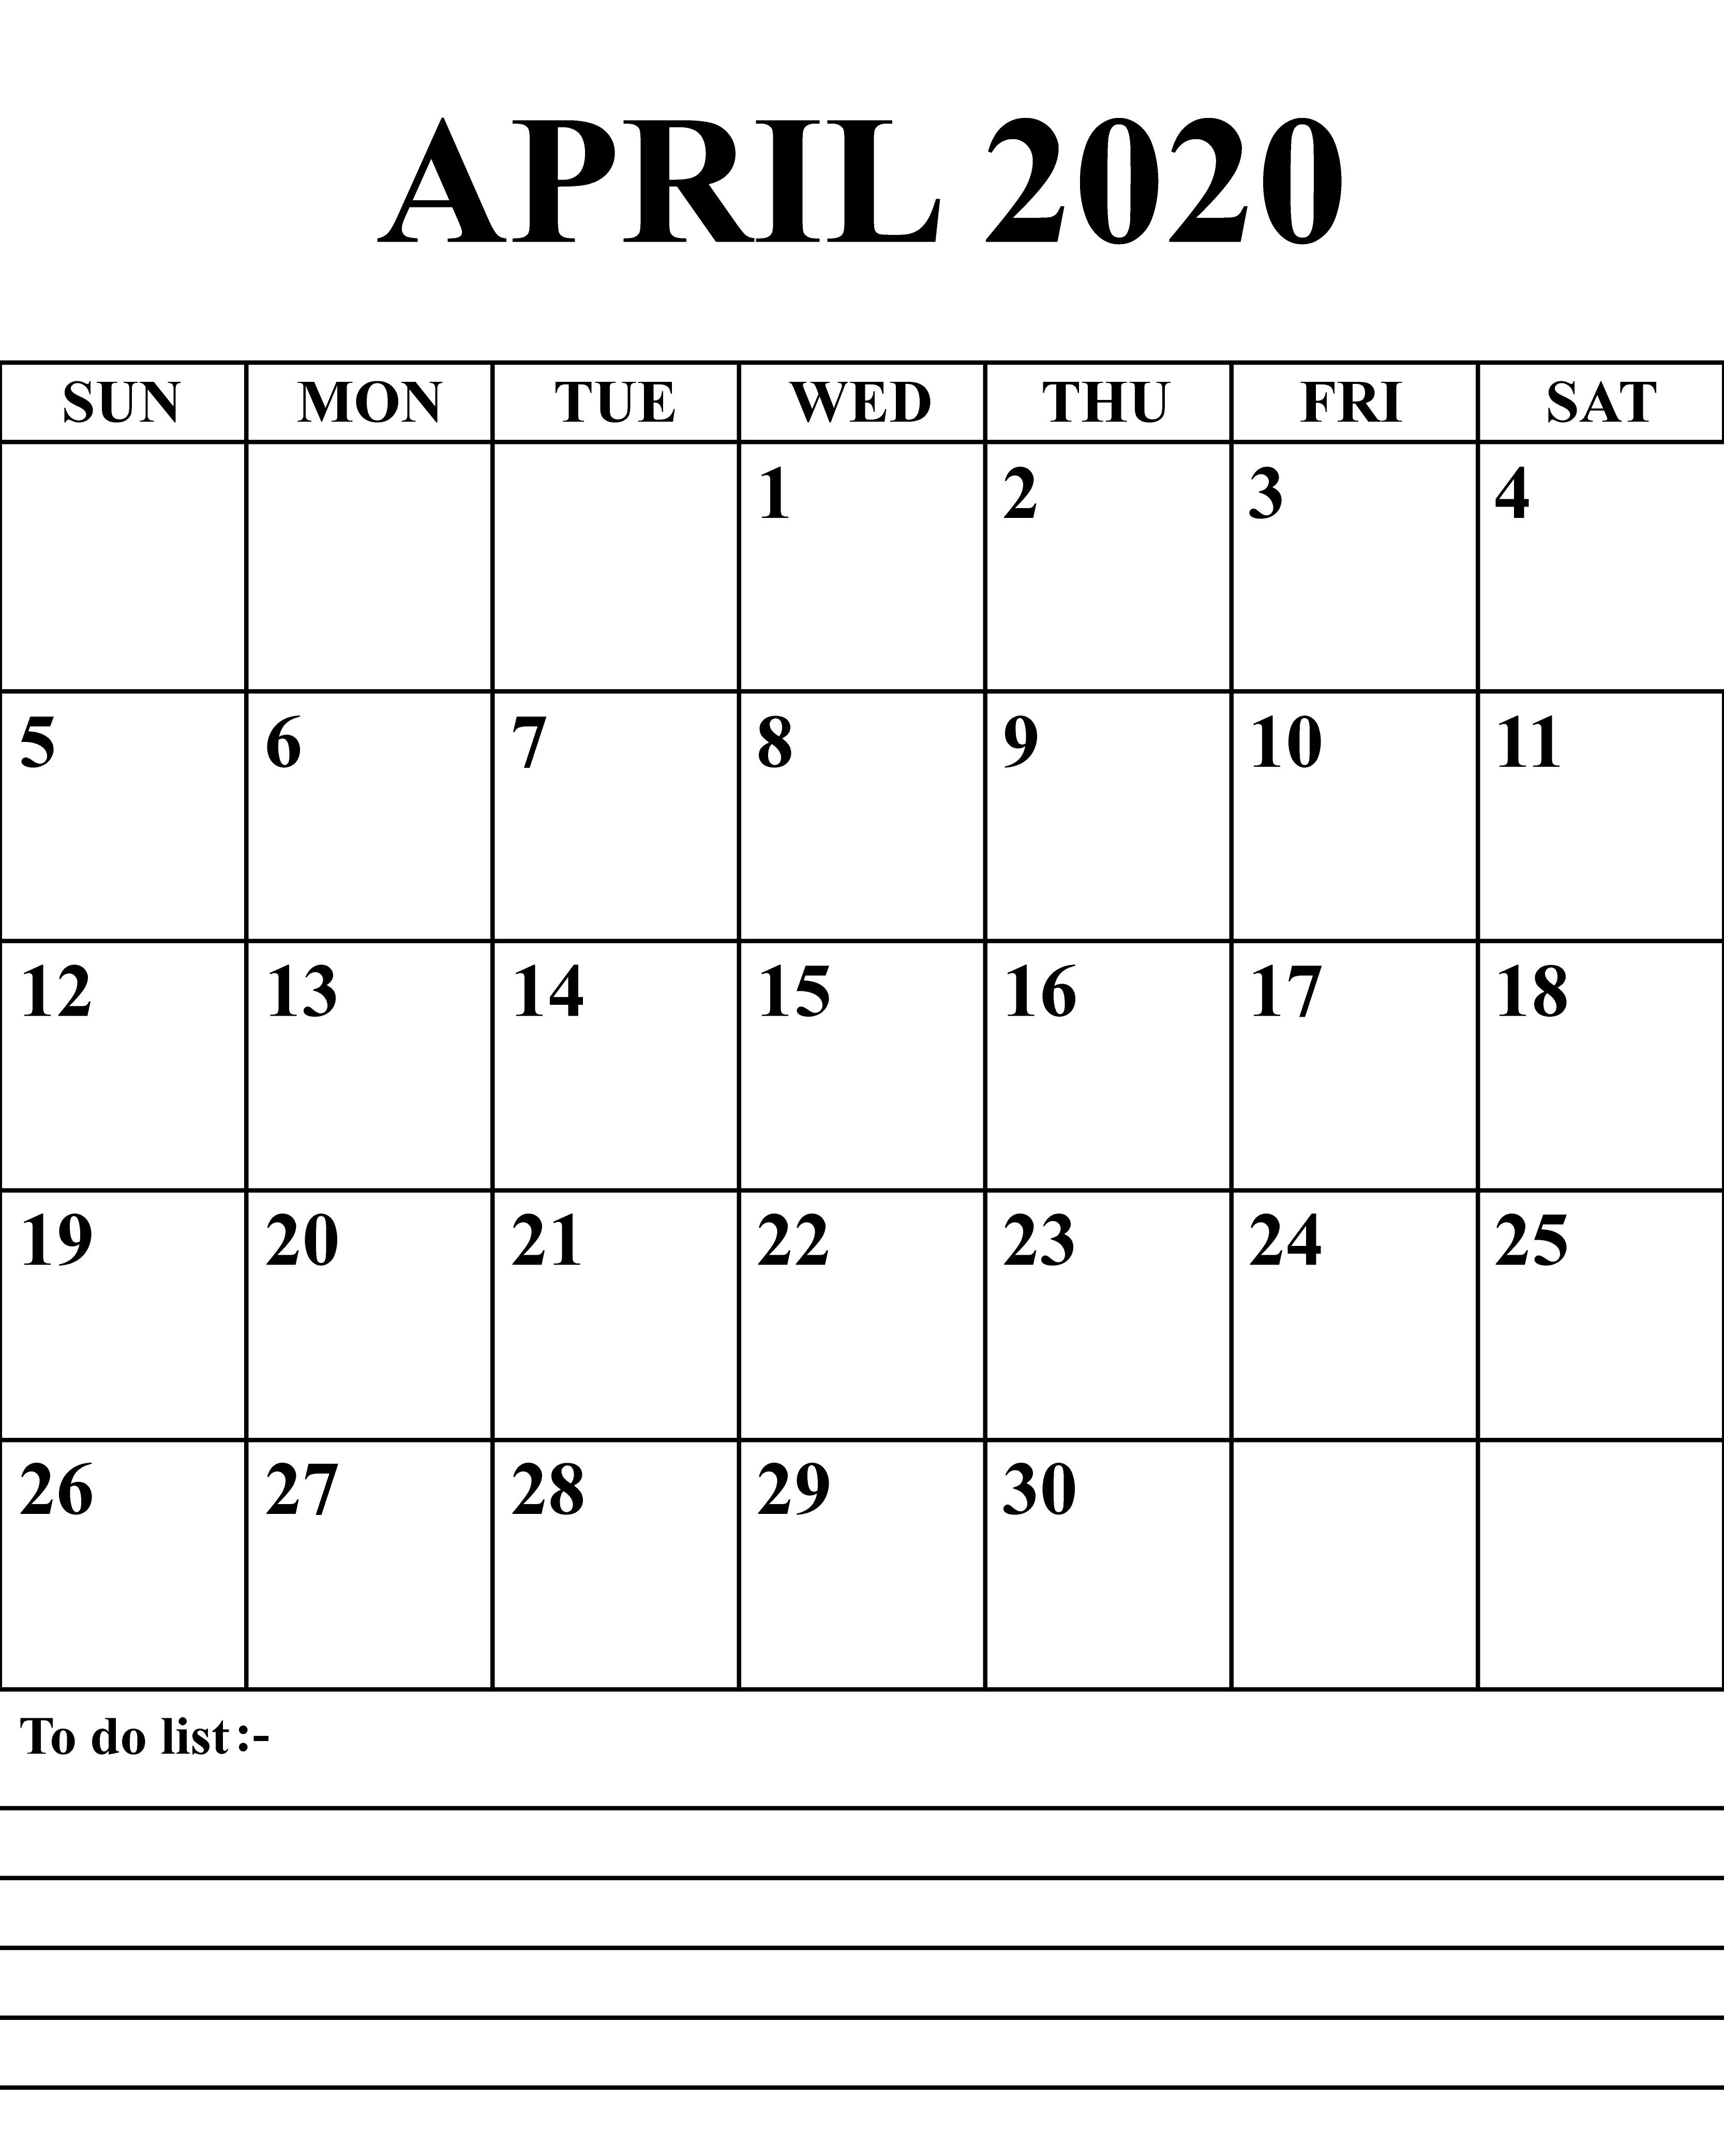 Printable April 2020 Calendars  |April 2020 Calendar